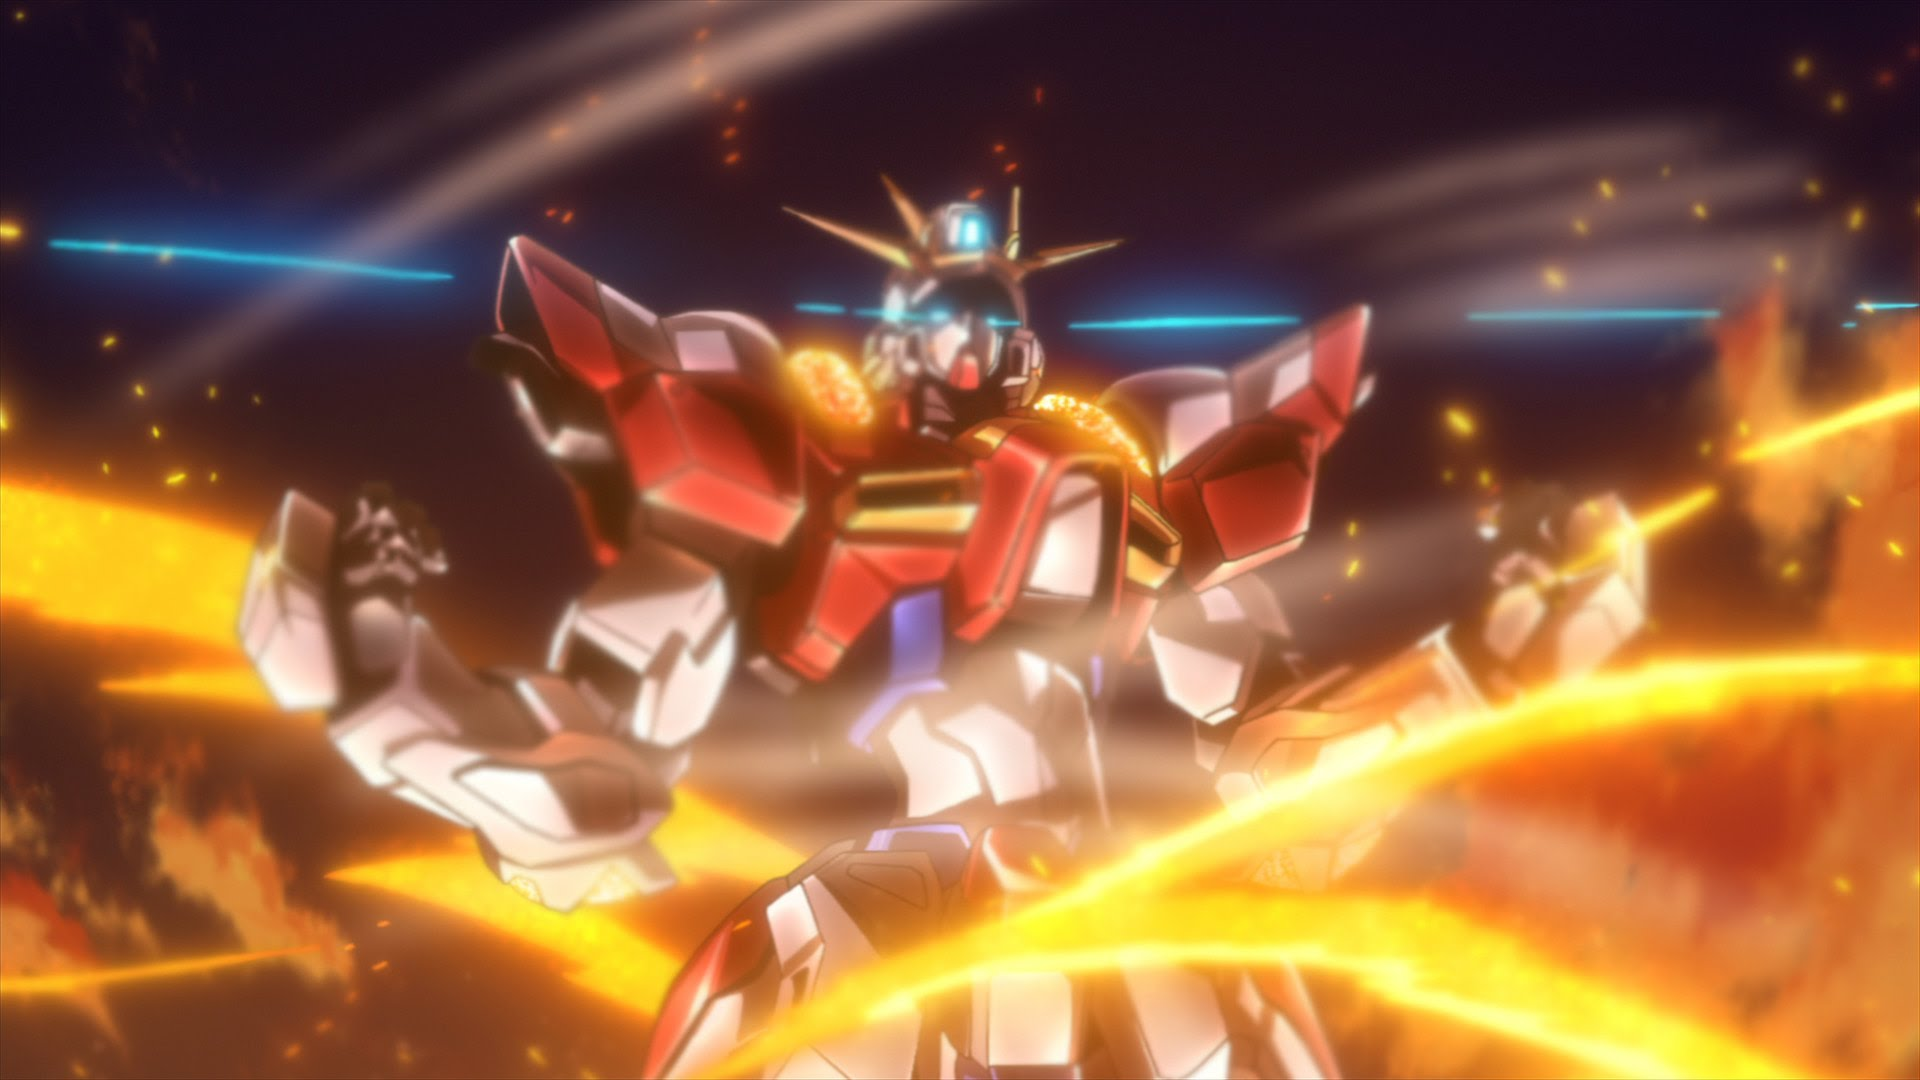 Hg Build Burning Gundam Supar Robo Try Genkai Nante Nai Zettai